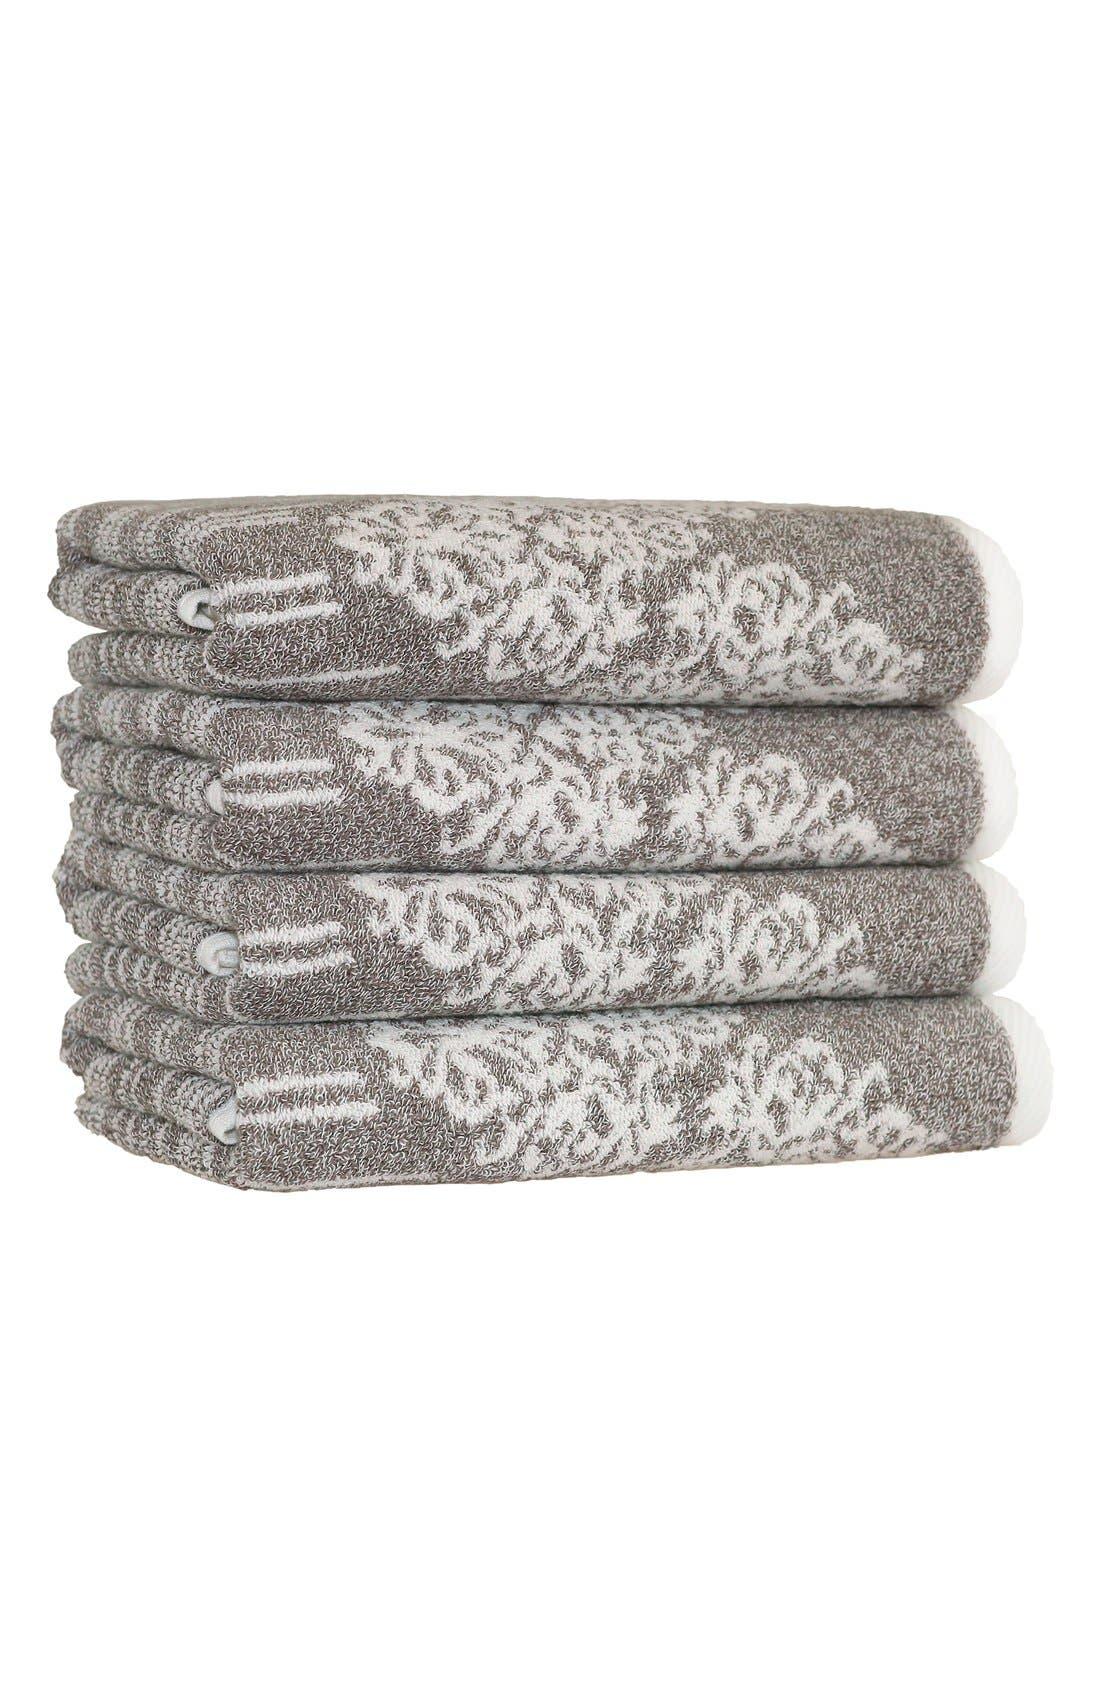 Linum 'Gioia' Turkish Cotton Hand Towels,                             Main thumbnail 1, color,                             200